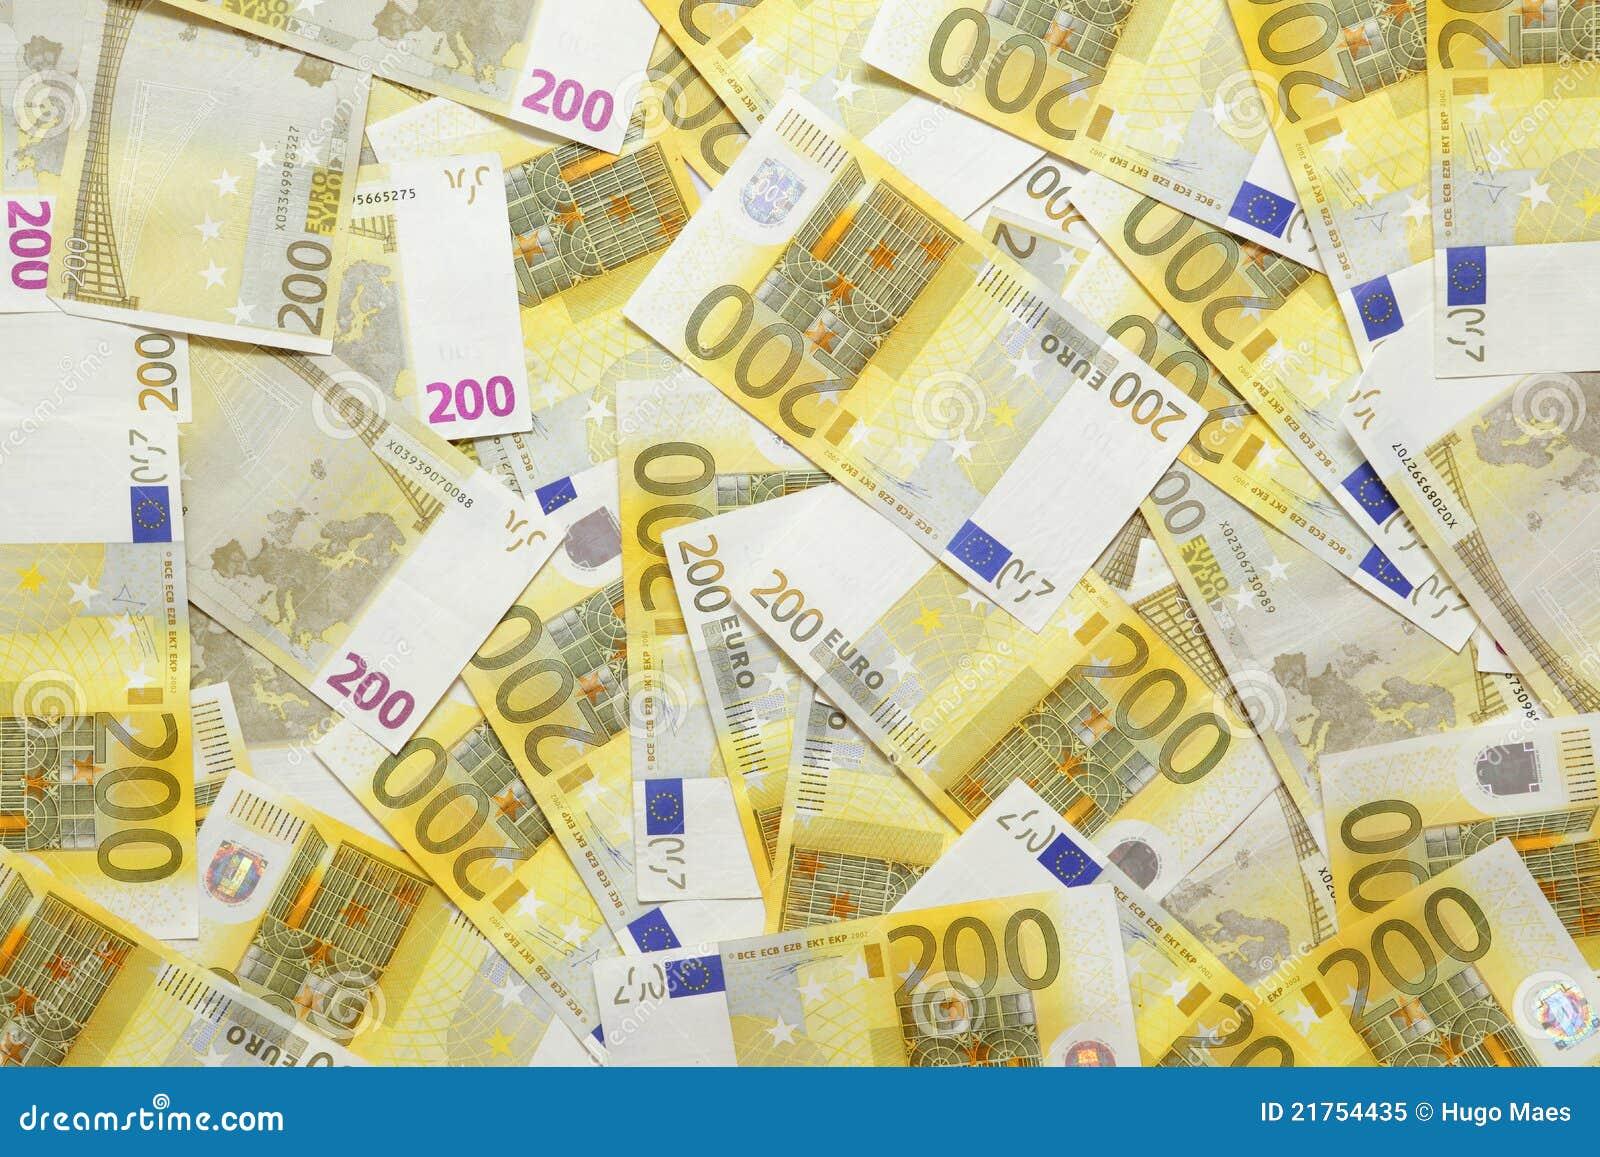 euro fond de billets de banque image stock image du cent groupe 21754435. Black Bedroom Furniture Sets. Home Design Ideas